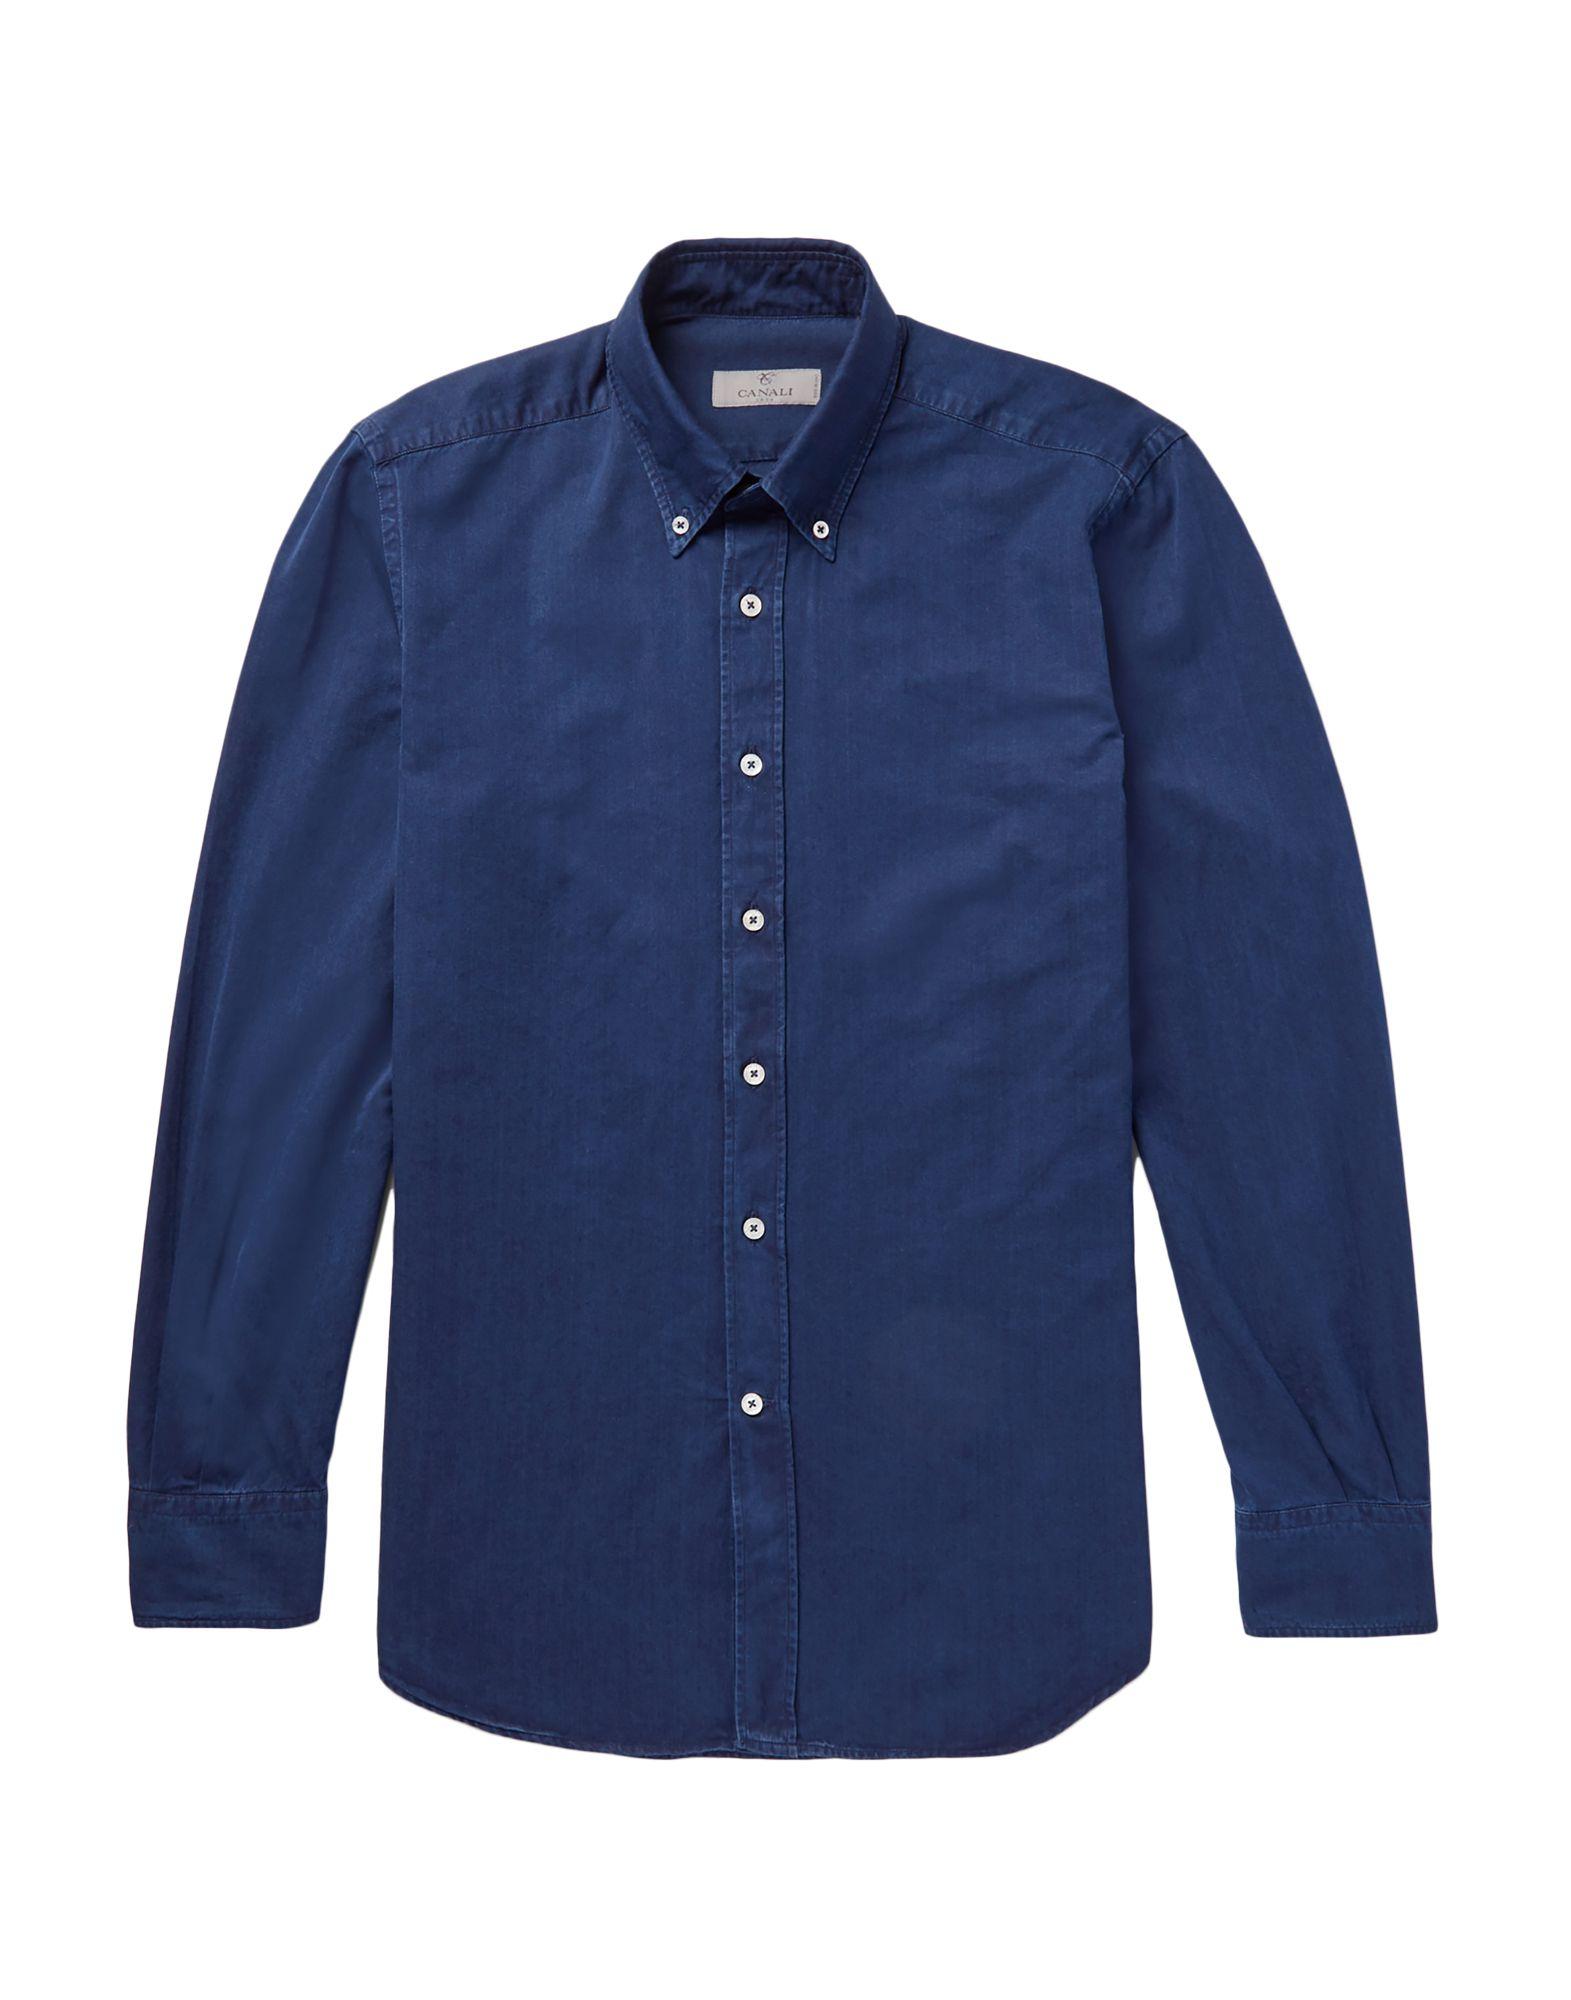 CANALI Джинсовая рубашка